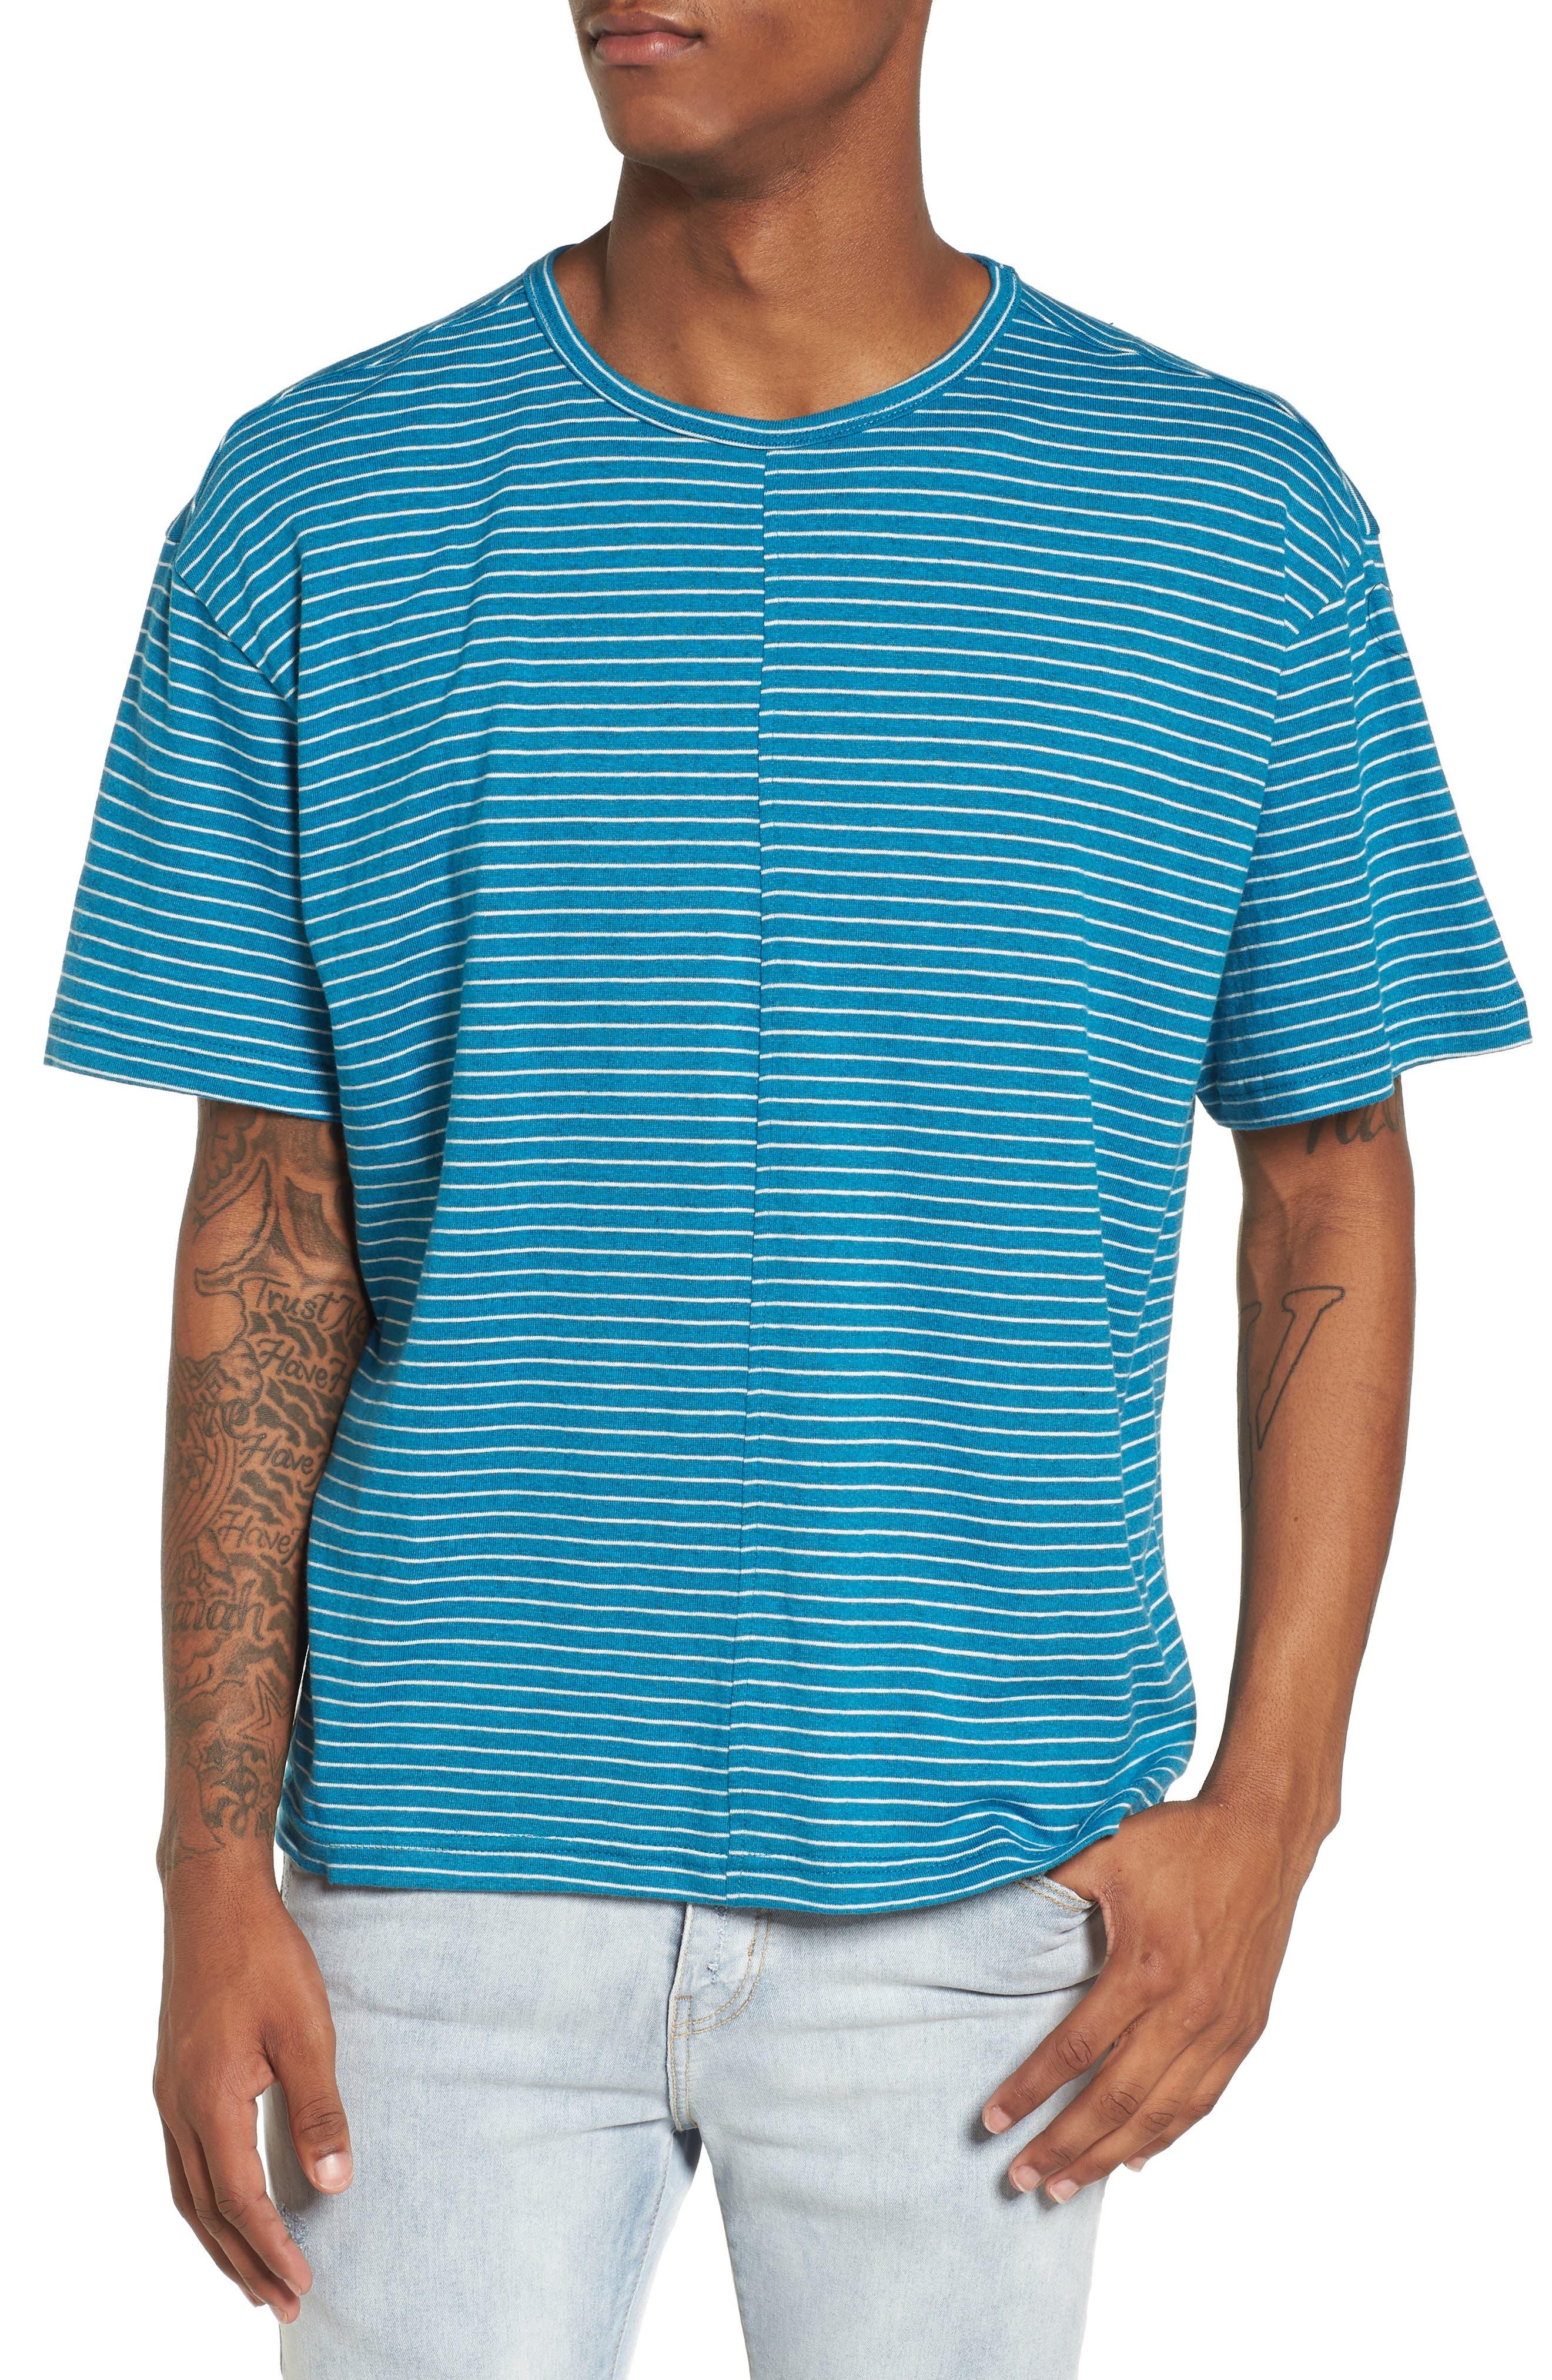 Boost T-Shirt,                         Main,                         color, 400